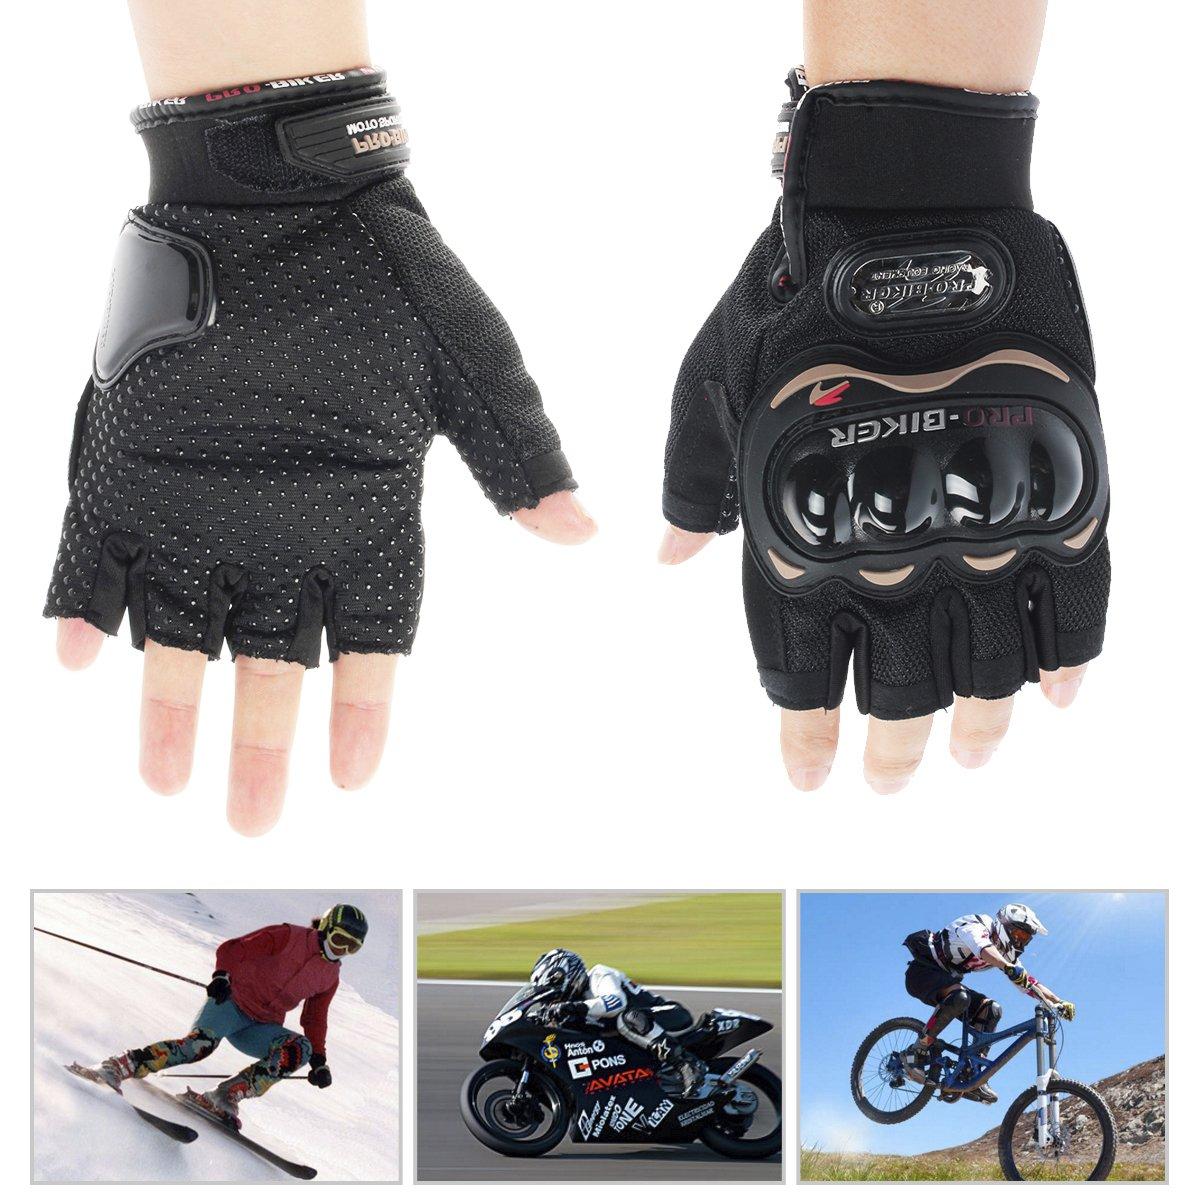 GES Men Outdoor Motorbike Gloves Guantes de ciclismo Motocicleta medio dedo Racing Motocross Guantes Azul, XXL